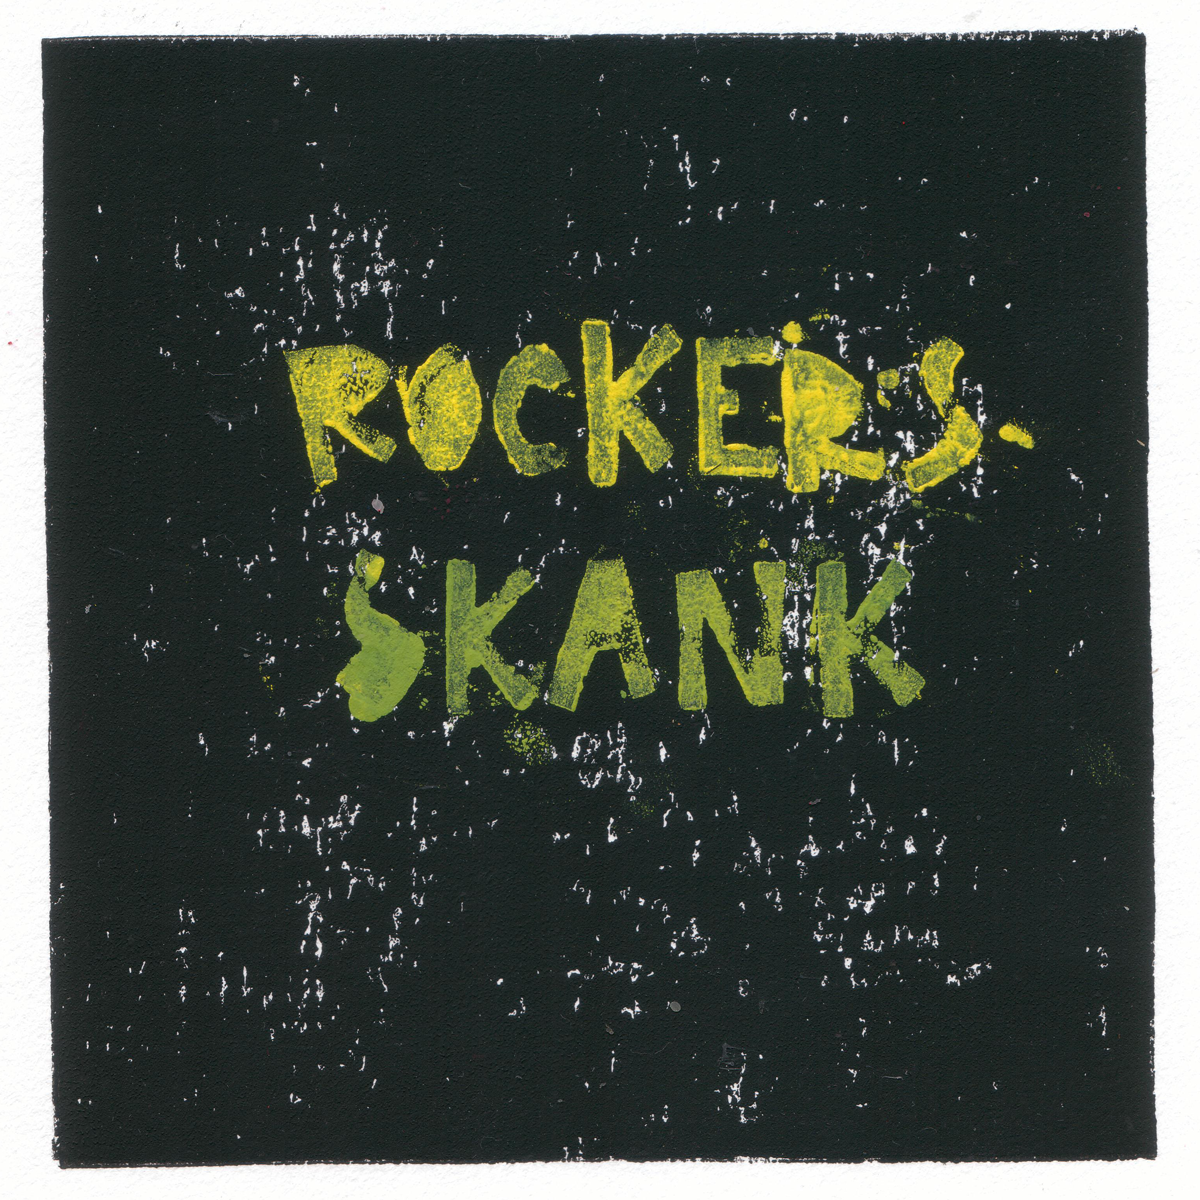 Mix | Rockers Skank